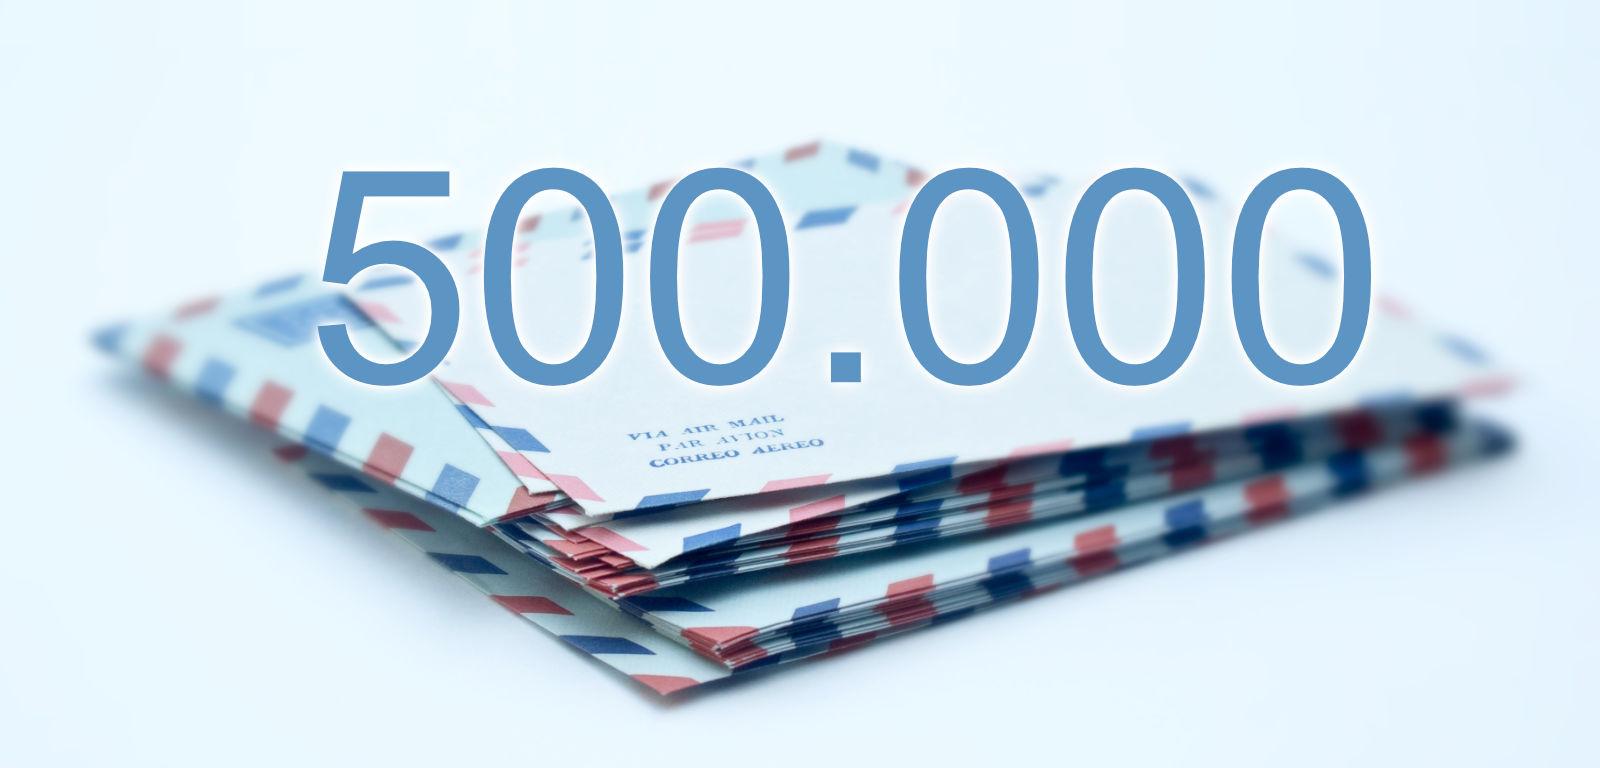 Halbe Million geknackt